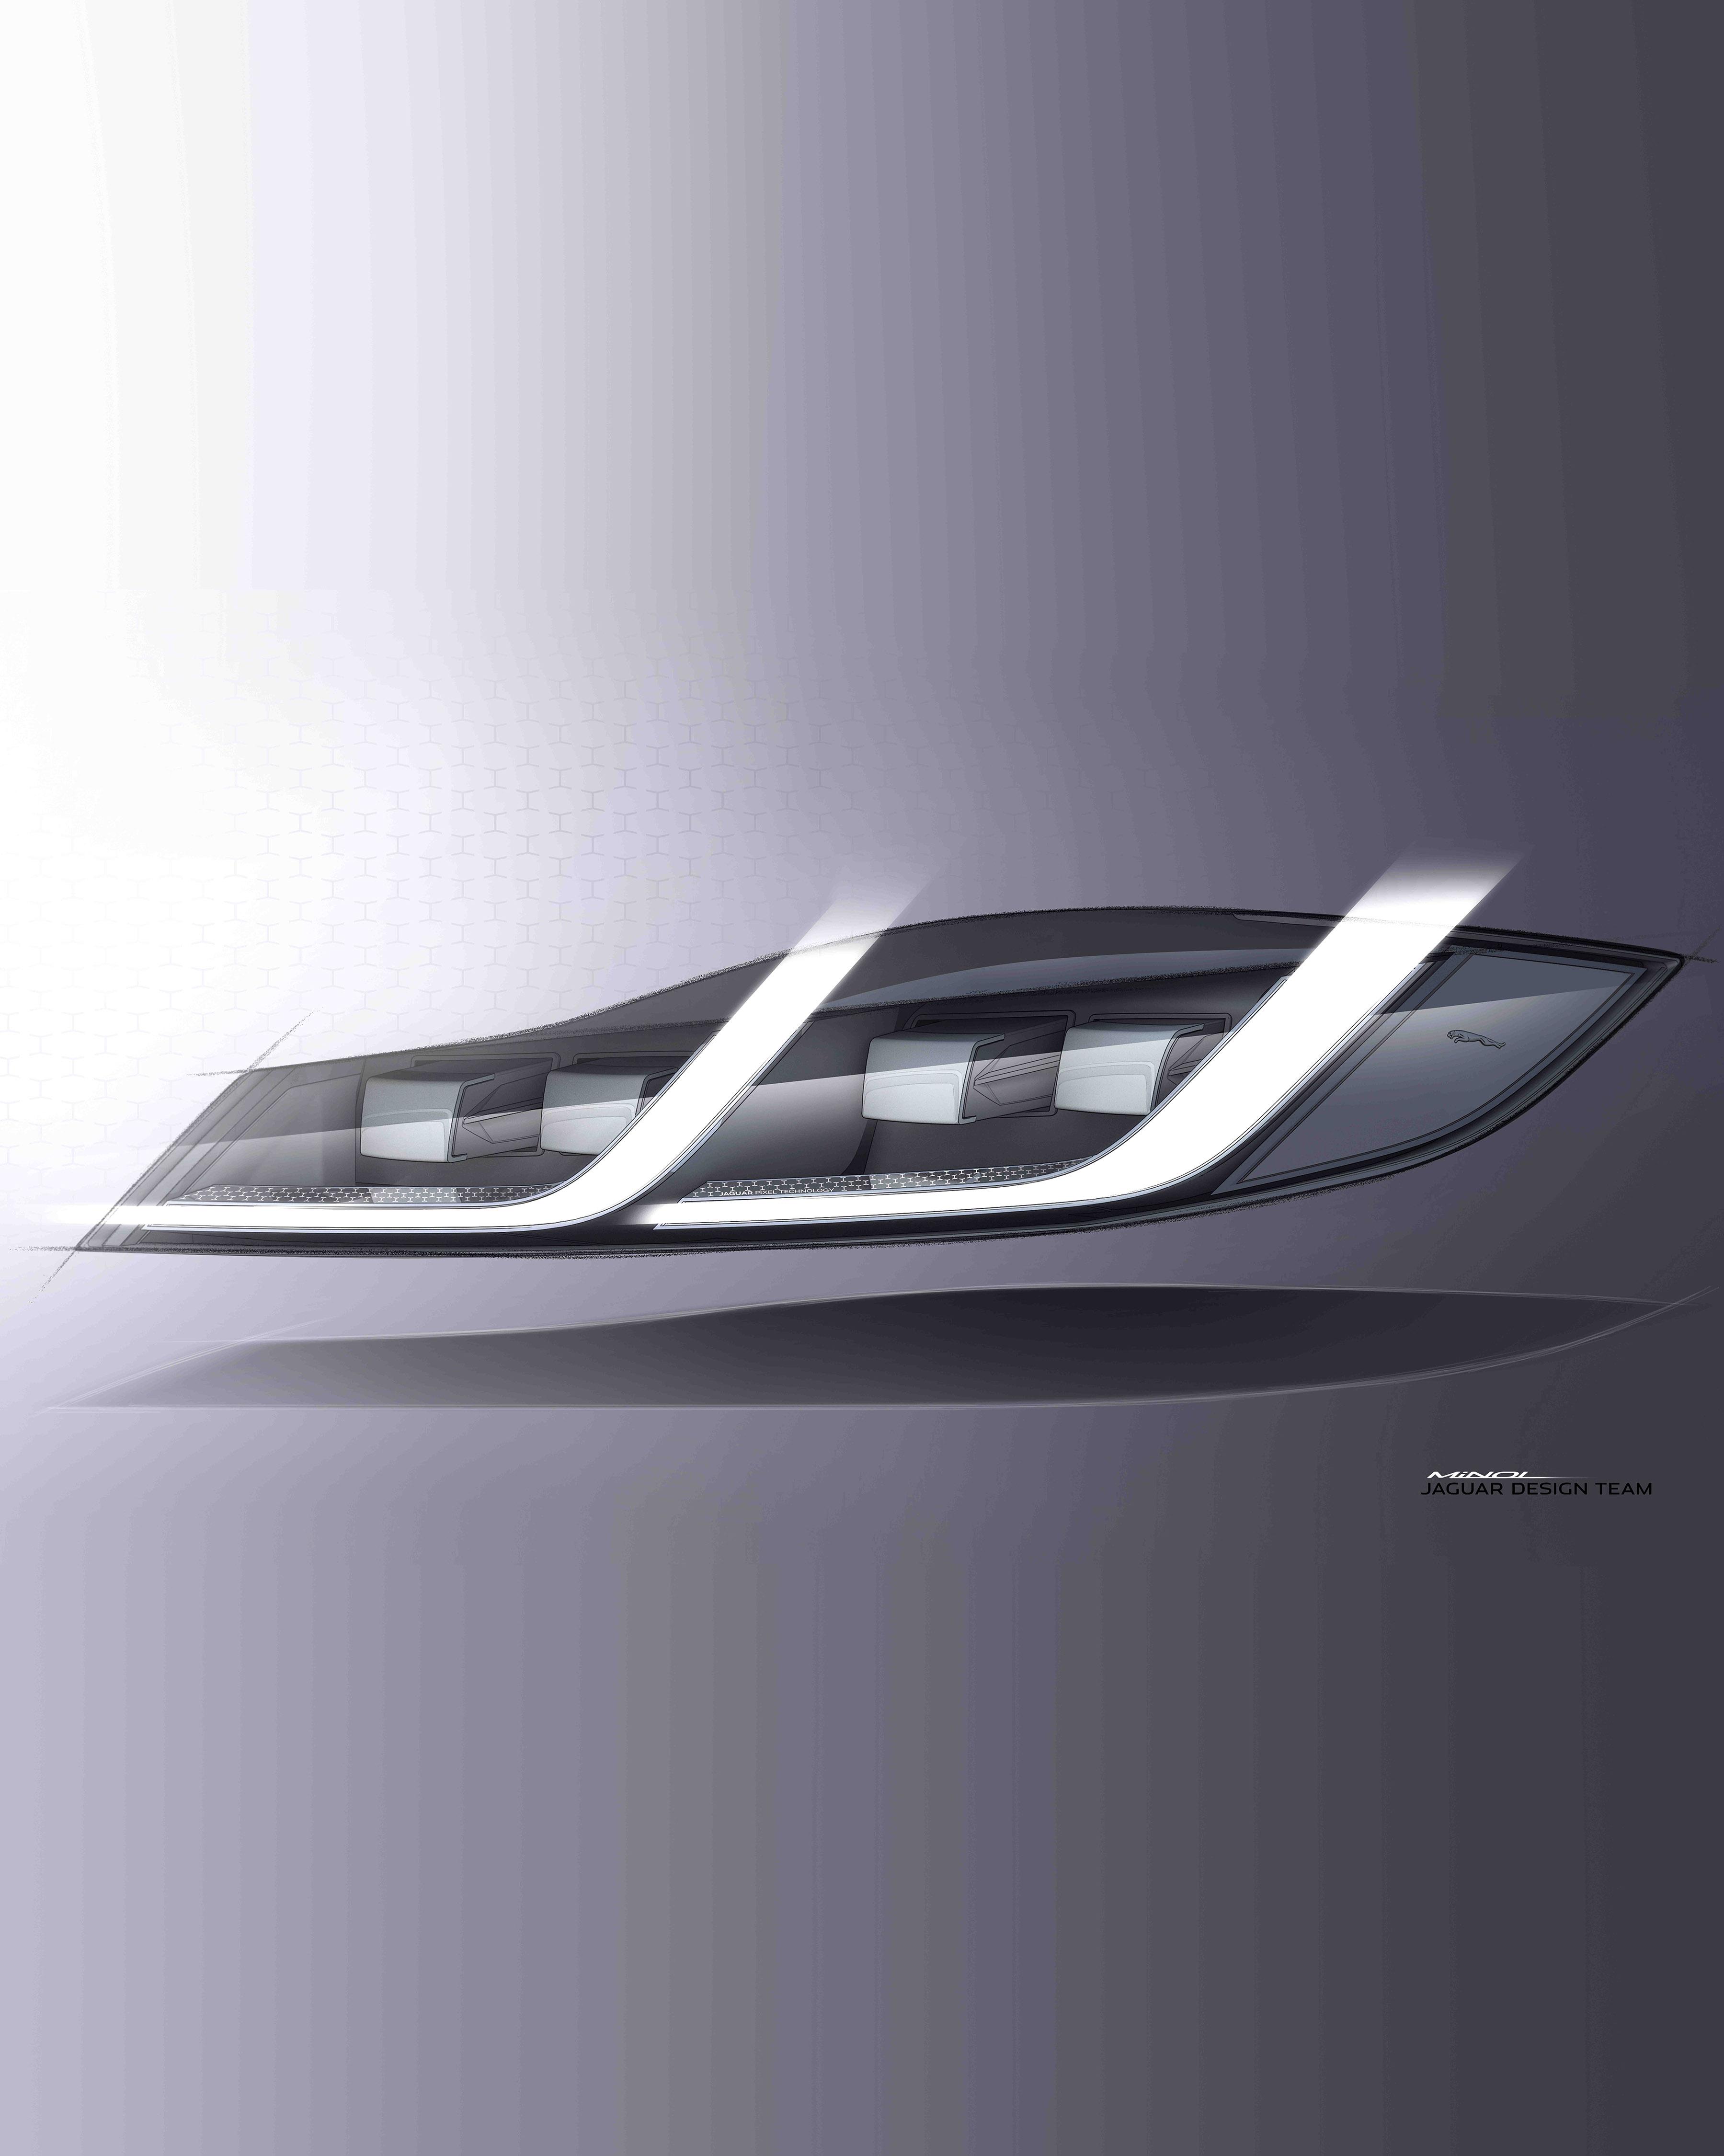 364552 jag f pace 21my design sketch 08 front light 4x5 150920 4275c6 original 1600091600